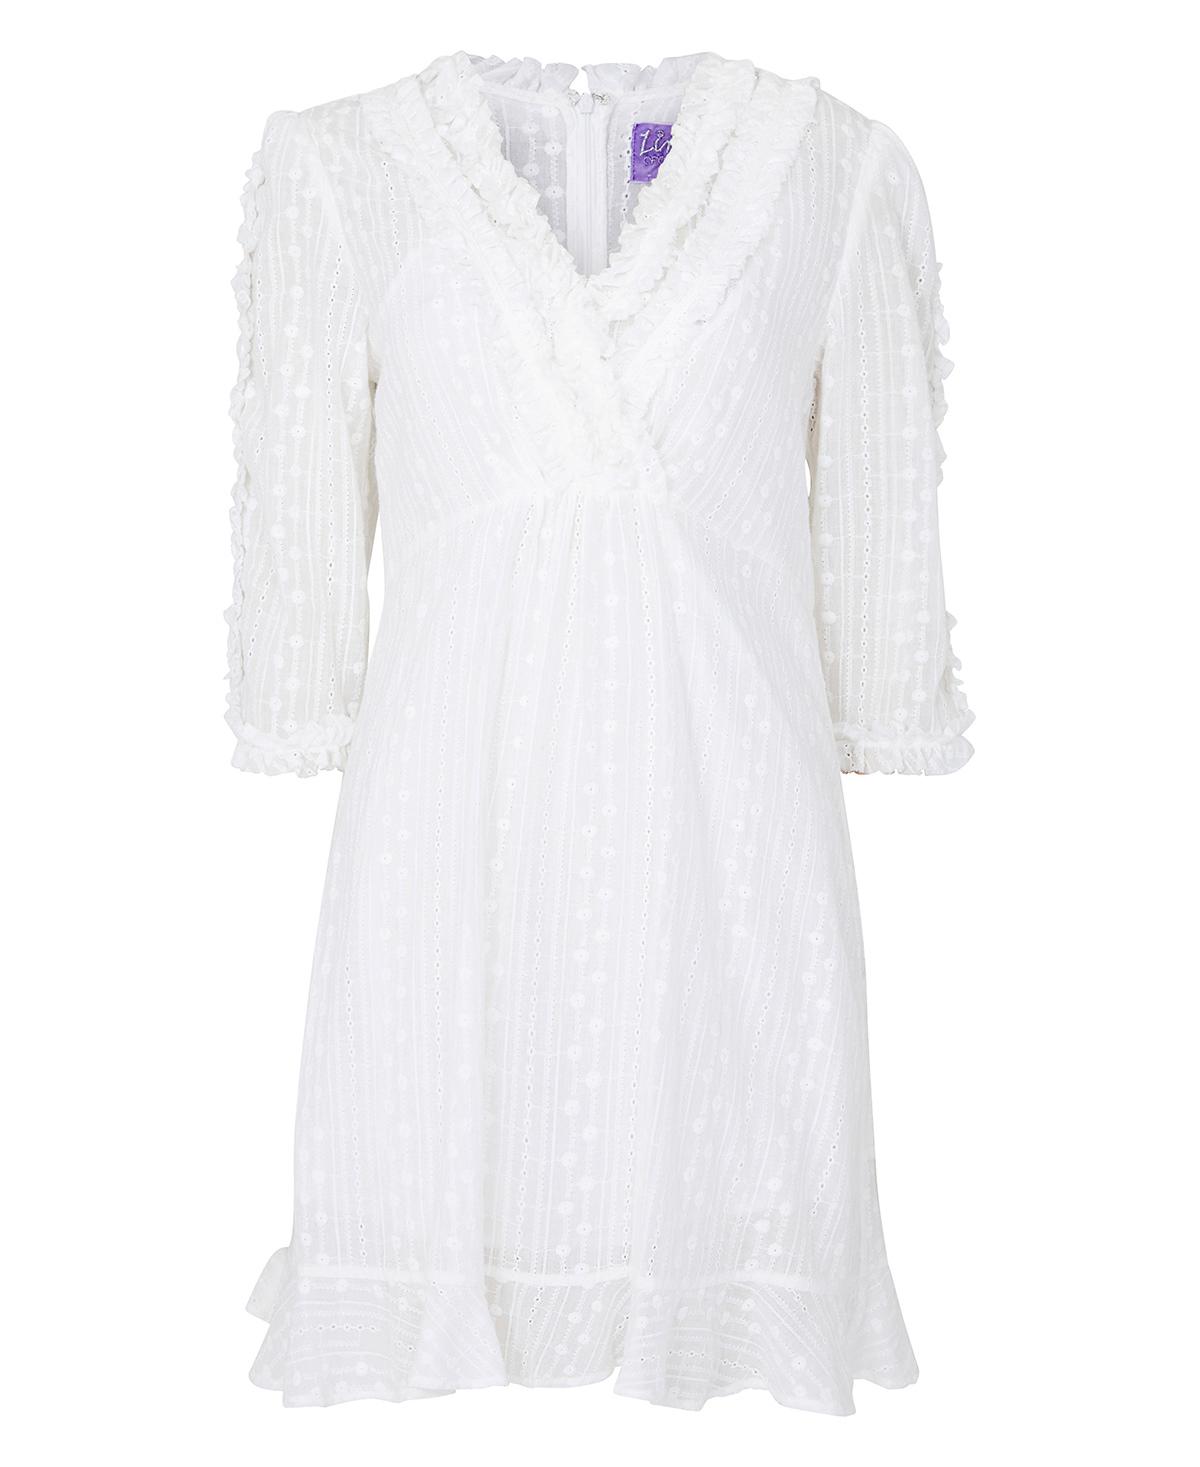 0e495615 Hvit kjole Line of Oslo – Line of Oslo hvit blondekjole Zelena – Mio Trend